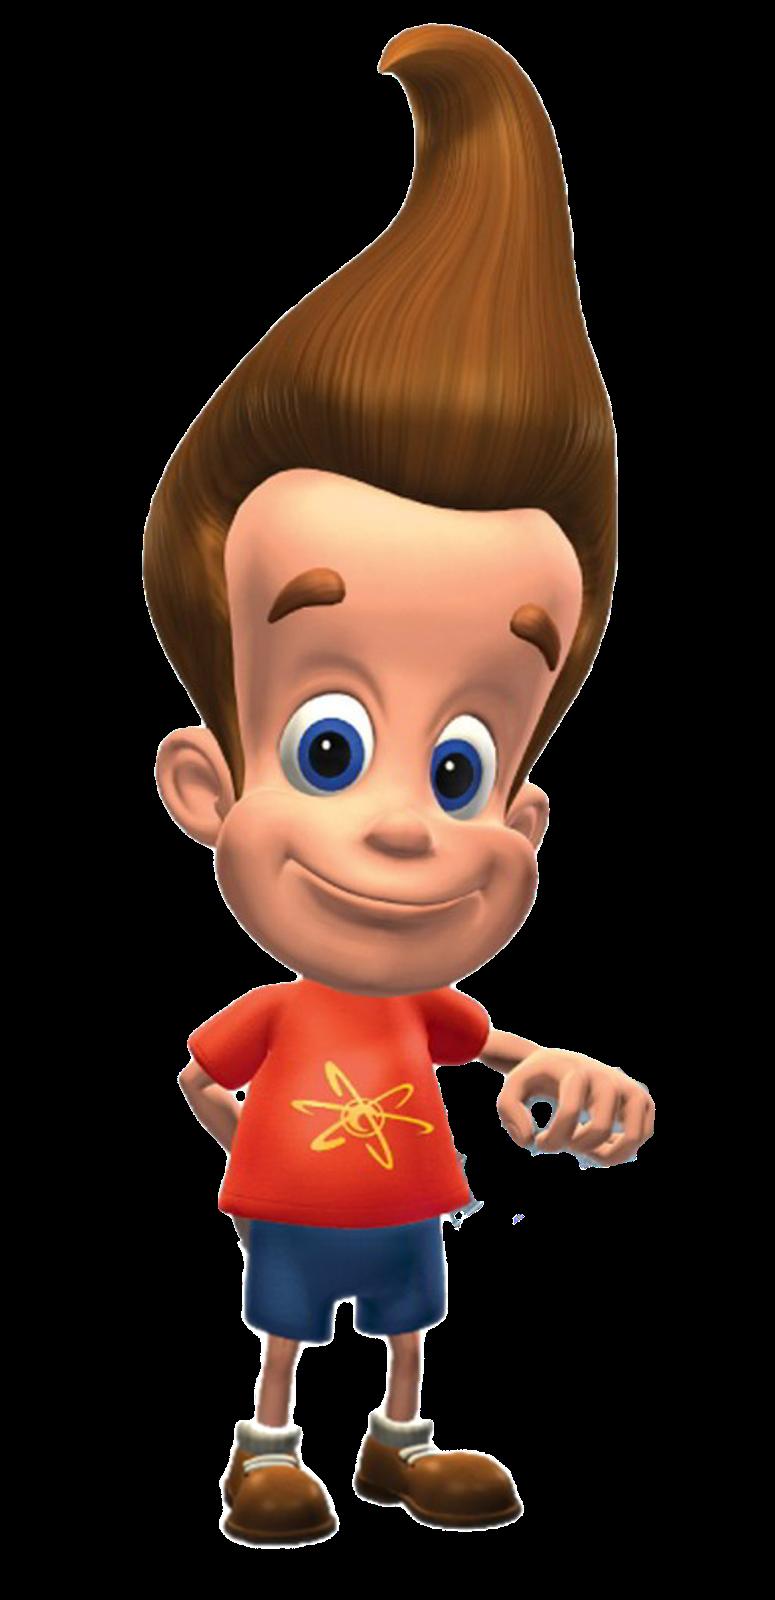 Carl from jimmy neutron gif